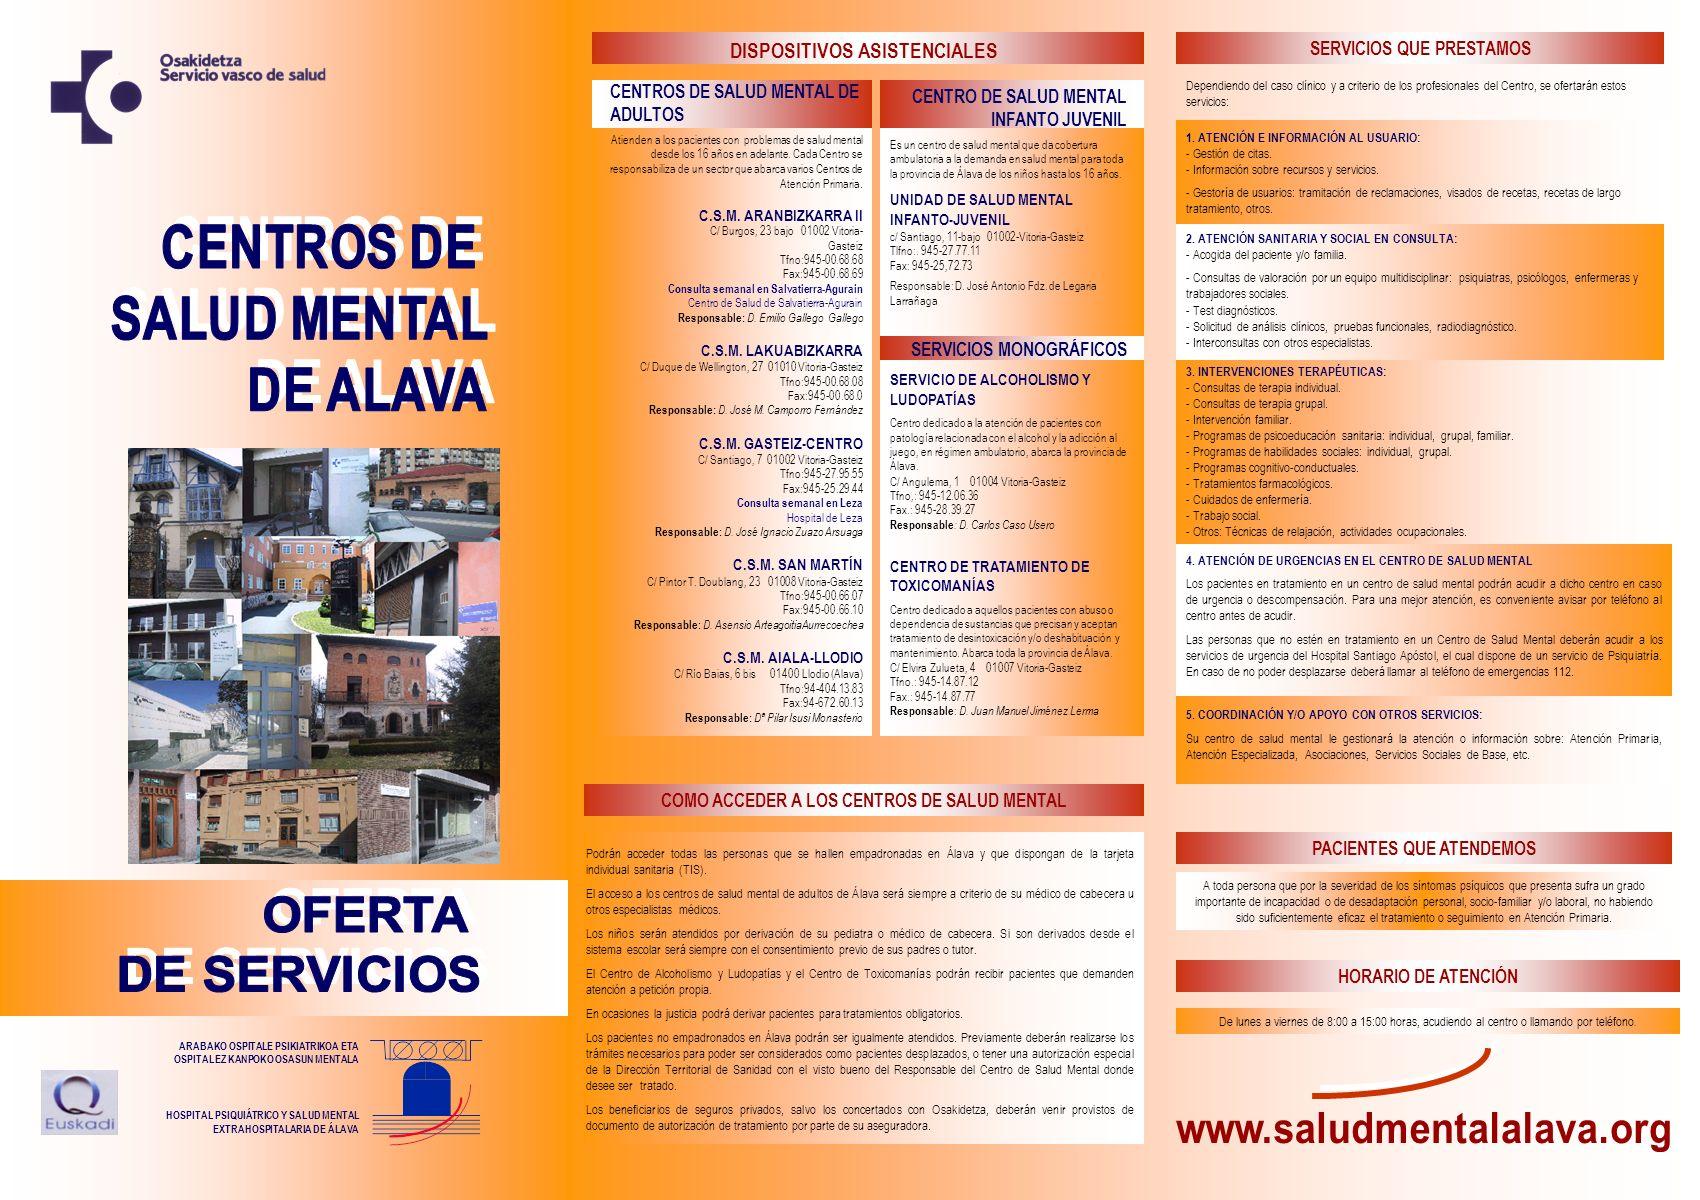 OFERTA DE SERVICIOS www.saludmentalalava.org